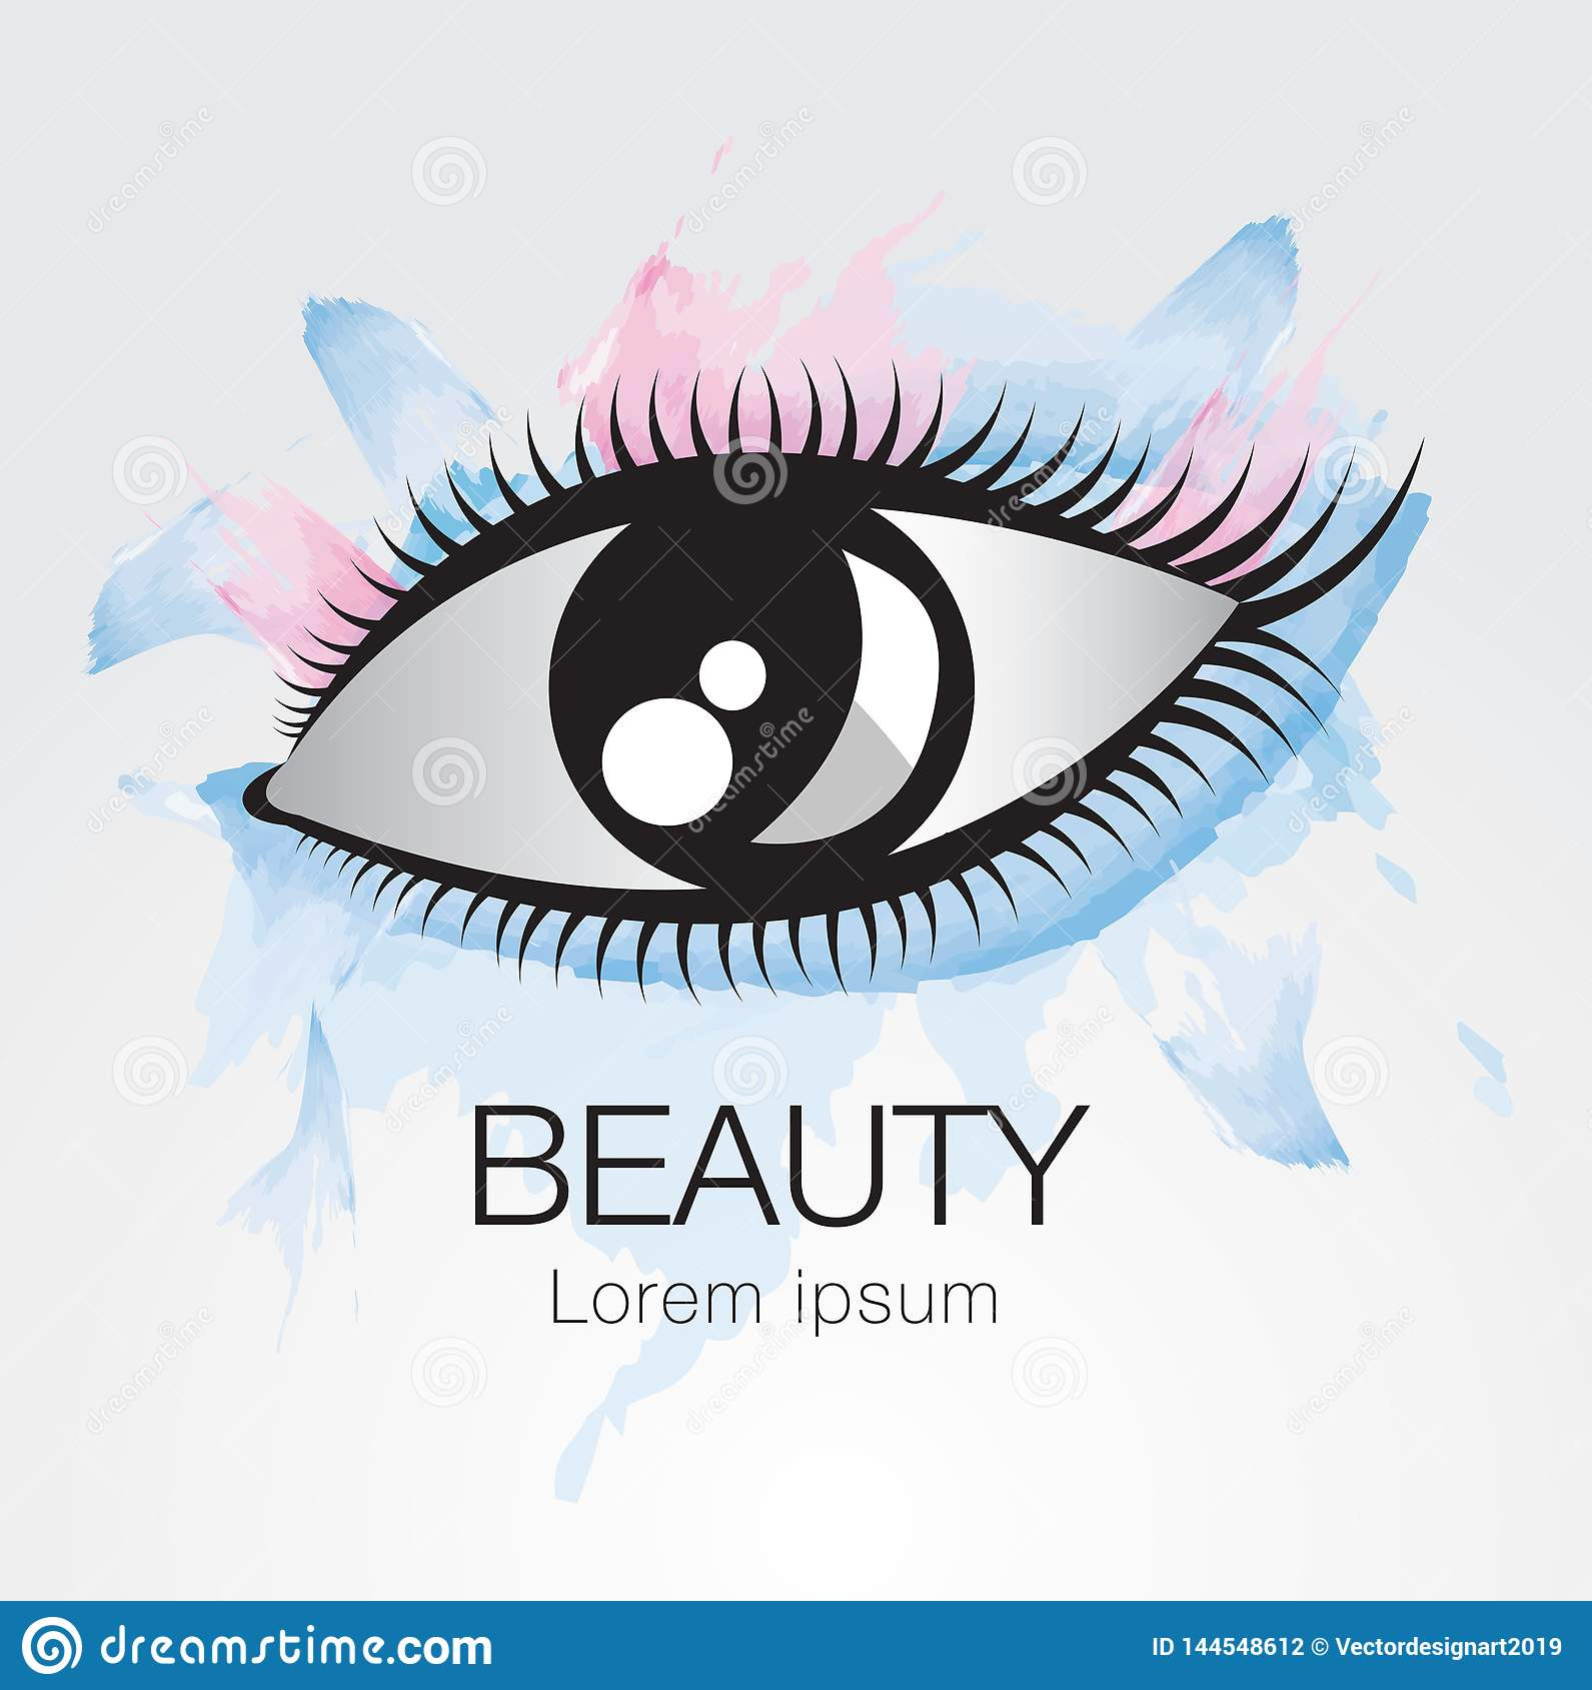 Eye vector icon, logo design for fashion, beauty, cosmetics, spa, web icon, hand drawn